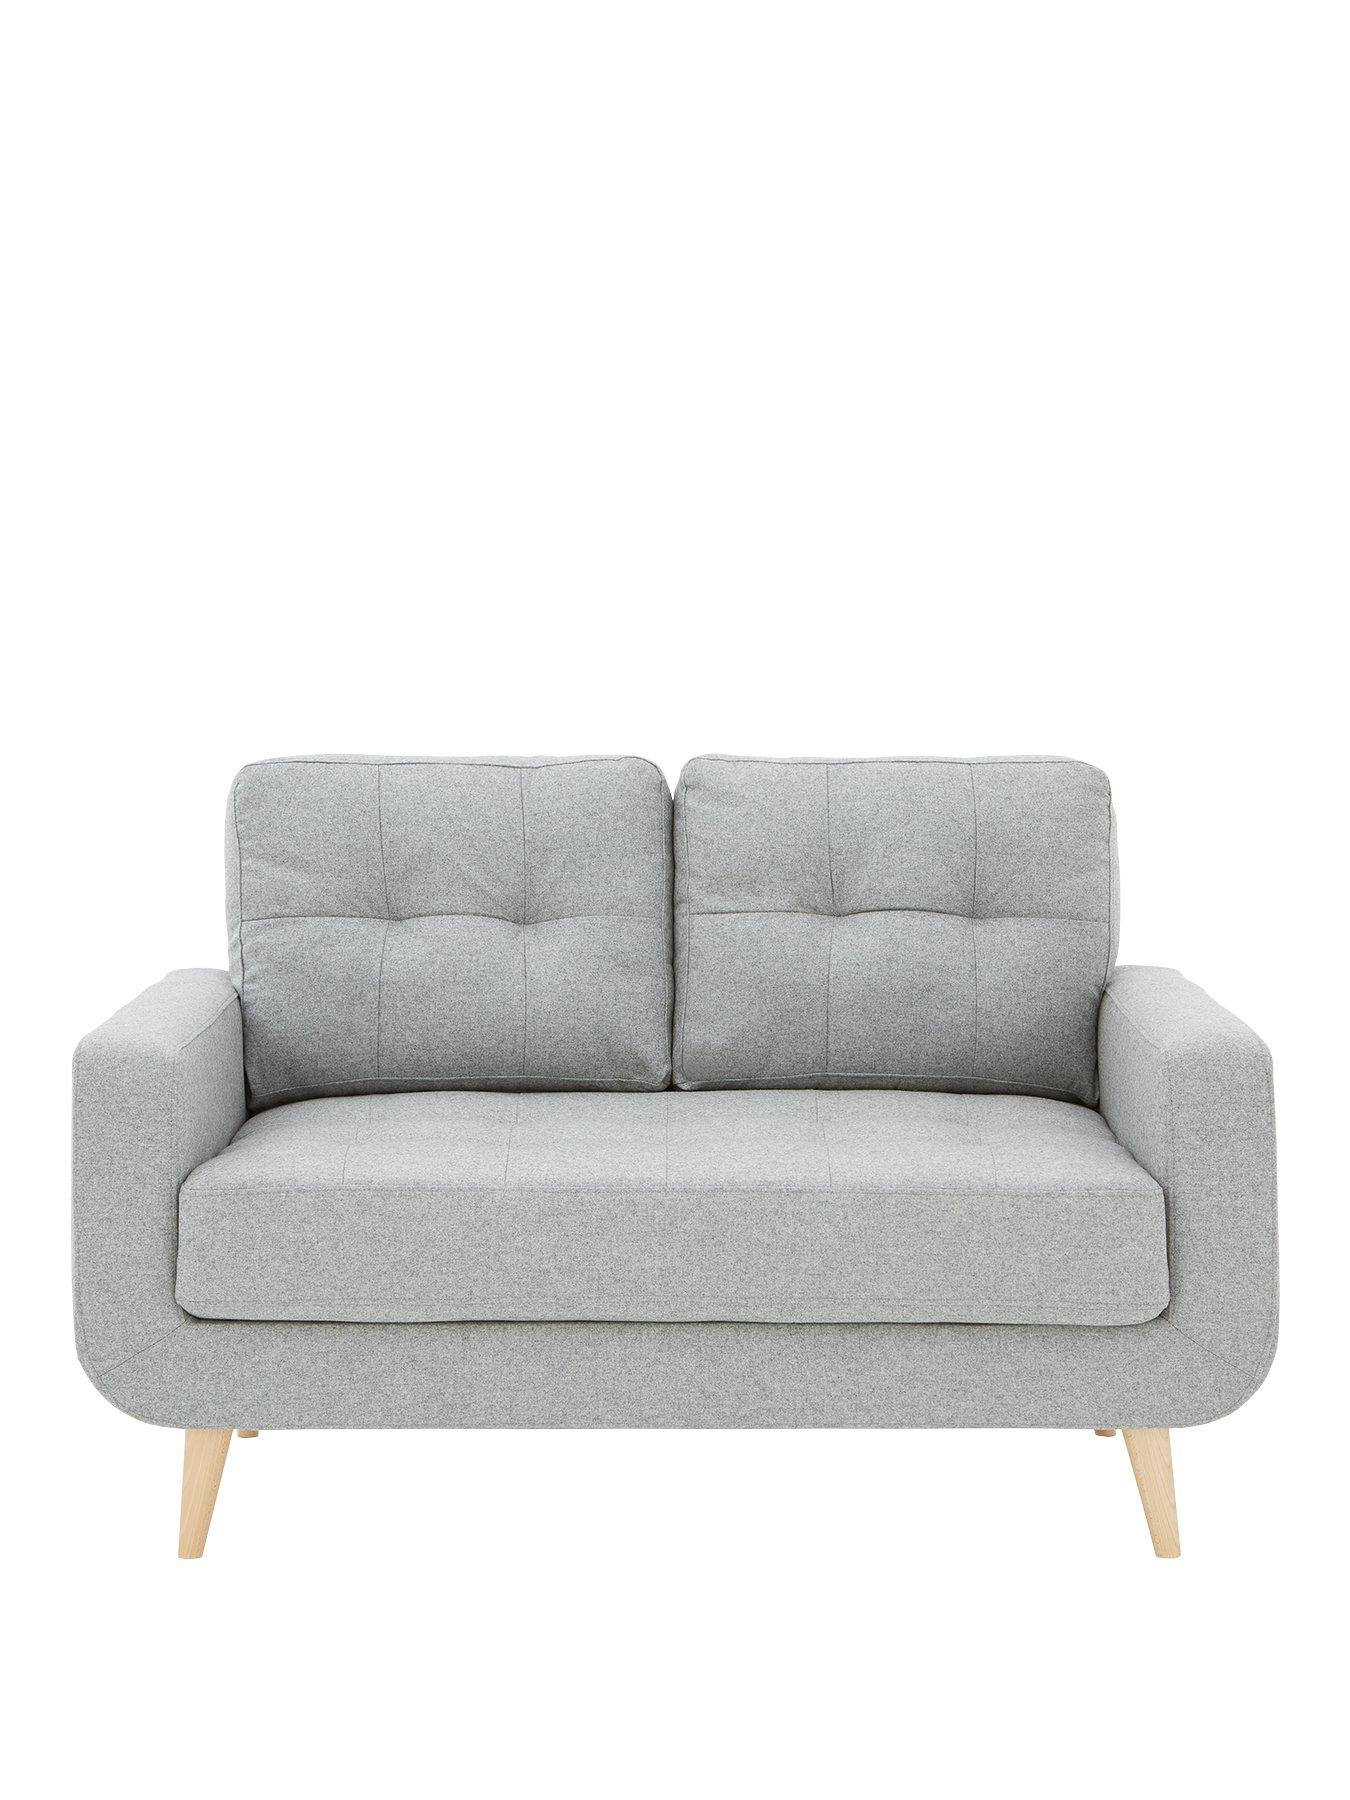 grey fabric sofa next brown cream cushions sofas corner recliner more very co uk skandi 2 seater